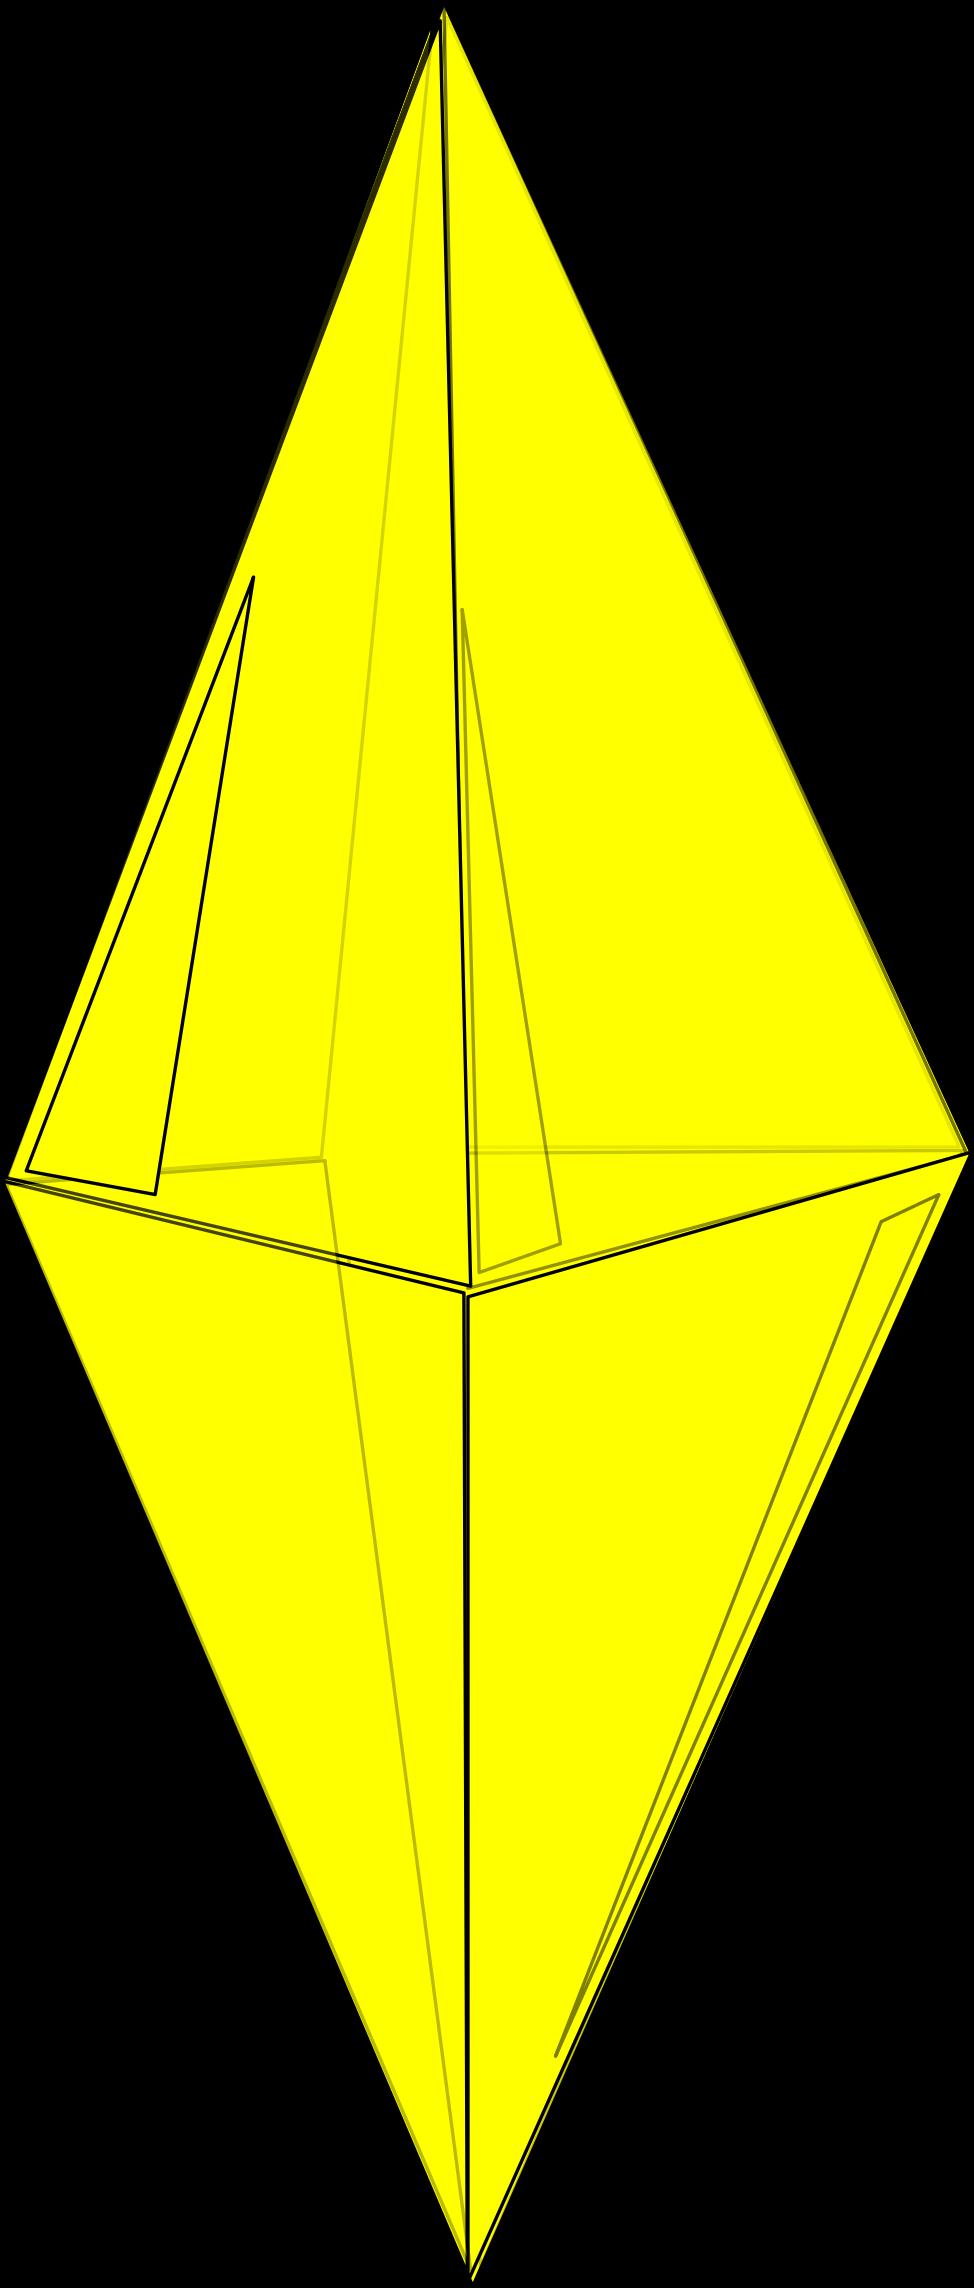 Crystal clipart yellow. Big image png